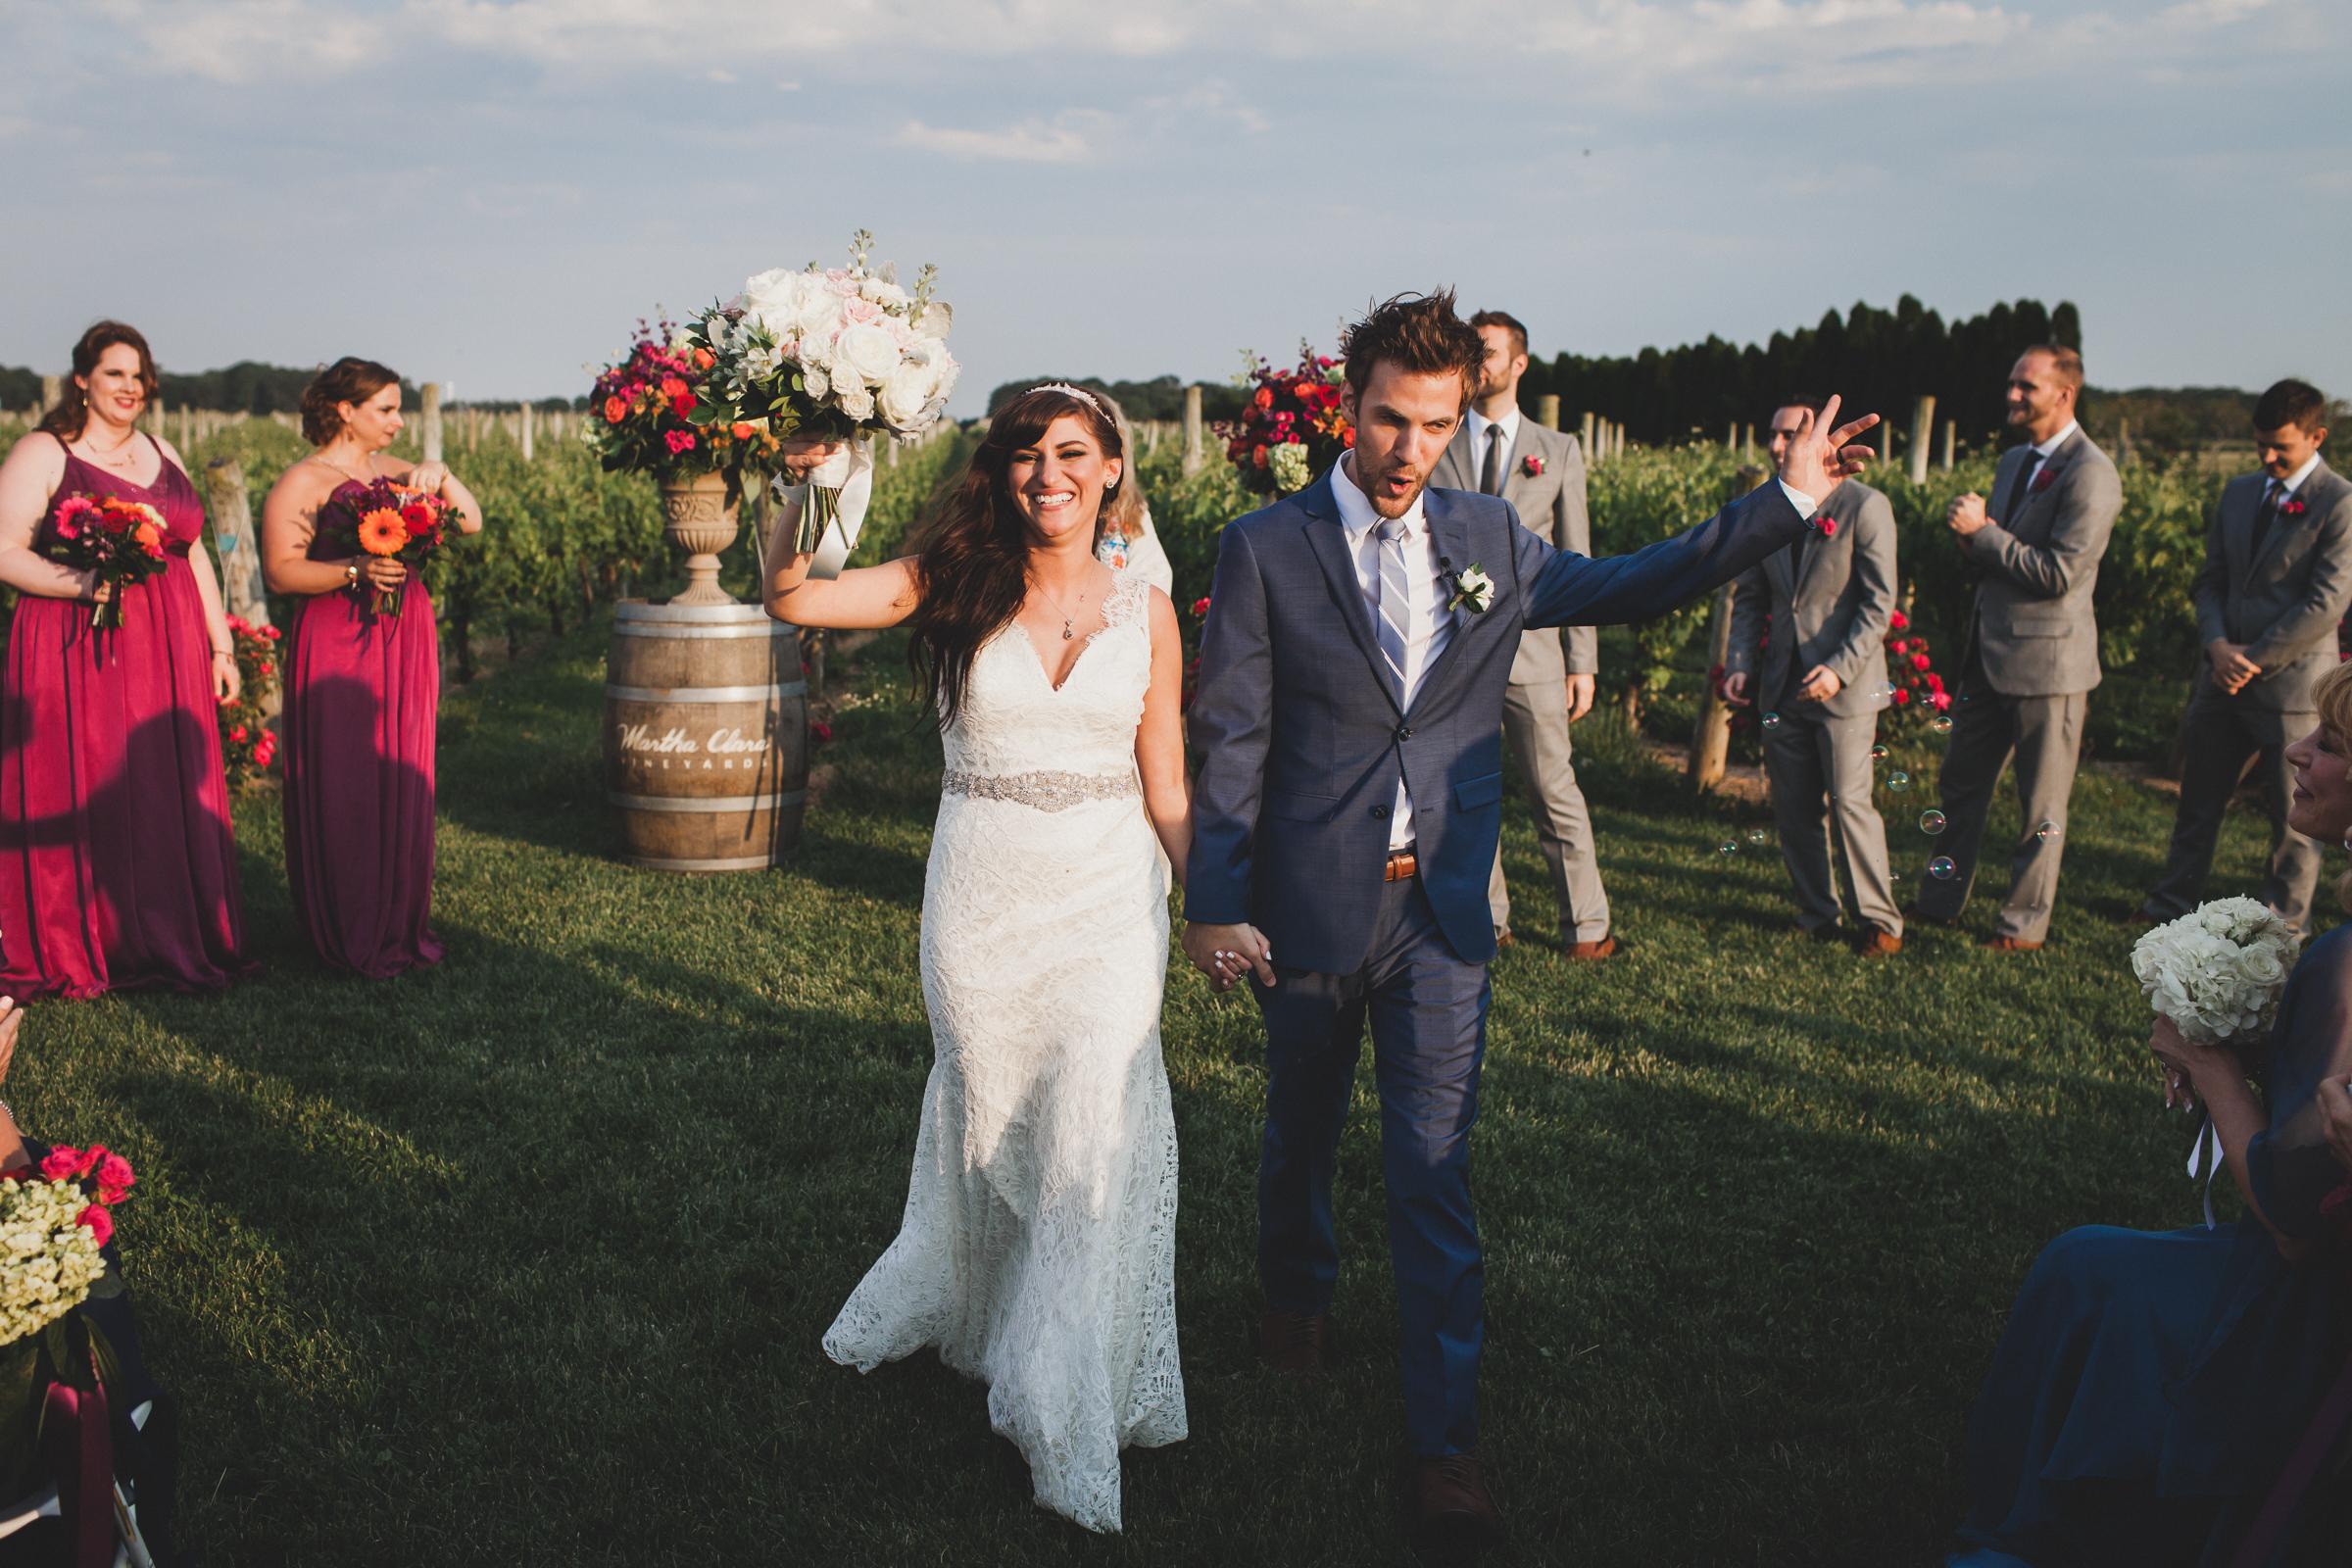 Martha-Clara-Vineyard-Long-Island-Documentary-Wedding-Photographer-59.jpg